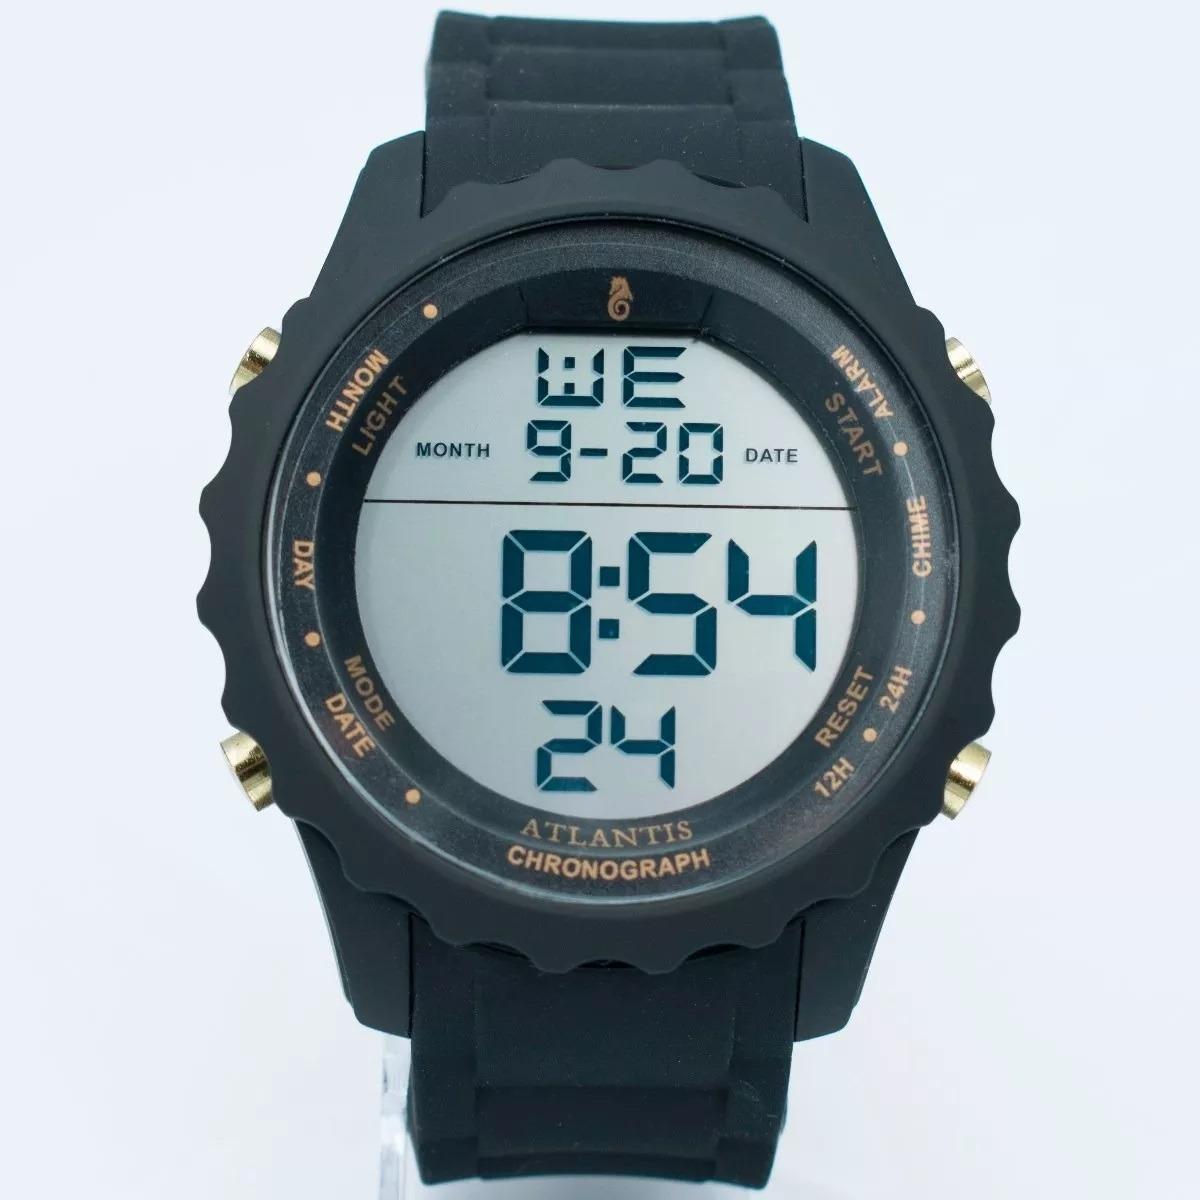 5a81e708daa relógio masculino digital esportivo cronômetro frete gratis. Carregando  zoom.